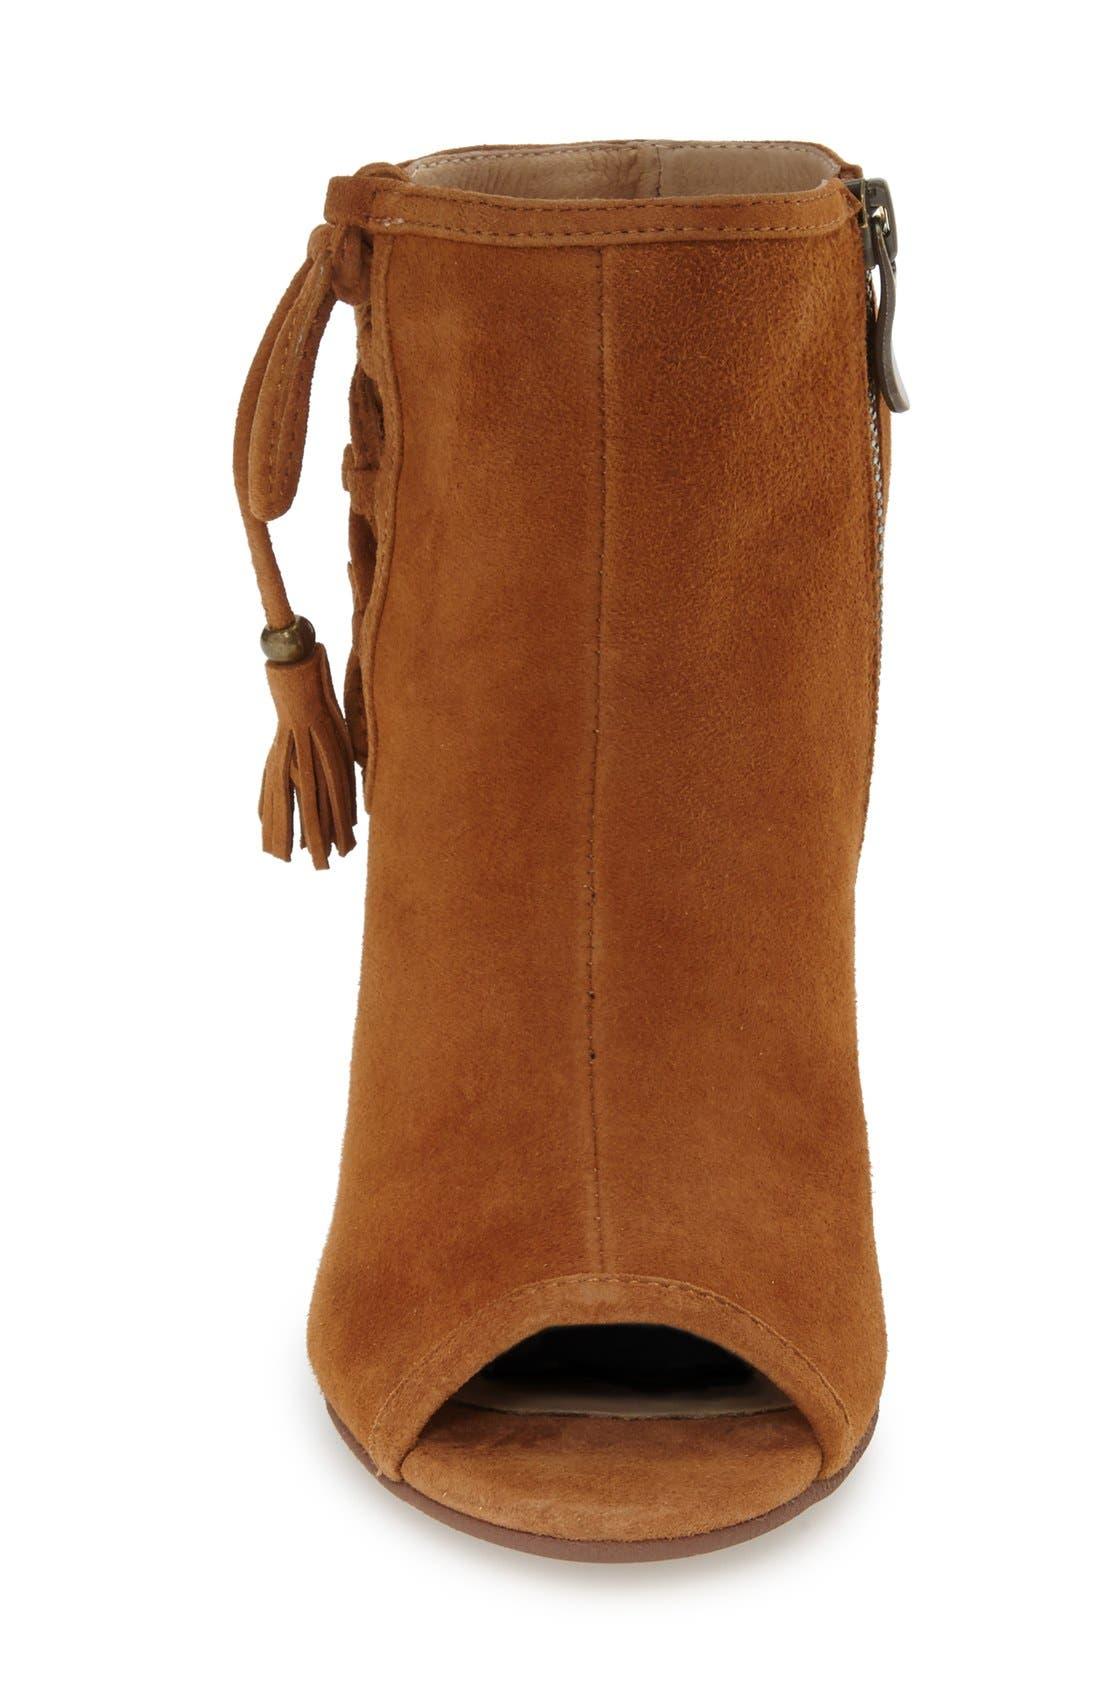 Alternate Image 3  - Kristin Cavallari 'Legend' Peep Toe Zip Bootie (Women)